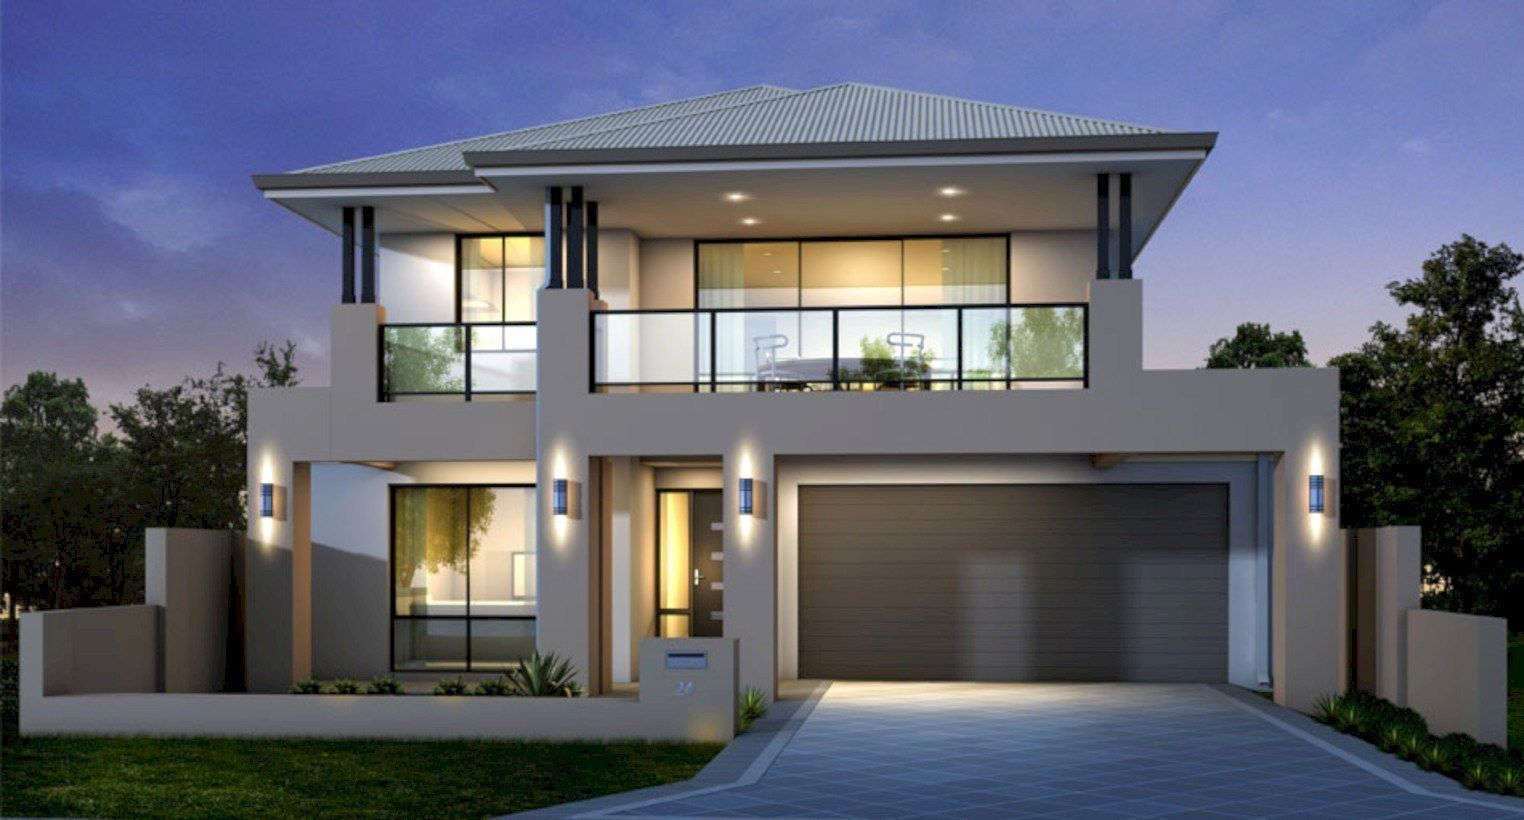 40 Best Modern Architecture Design Ideas Home Garden Modern Bungalow House Double Story House Modern House Plans